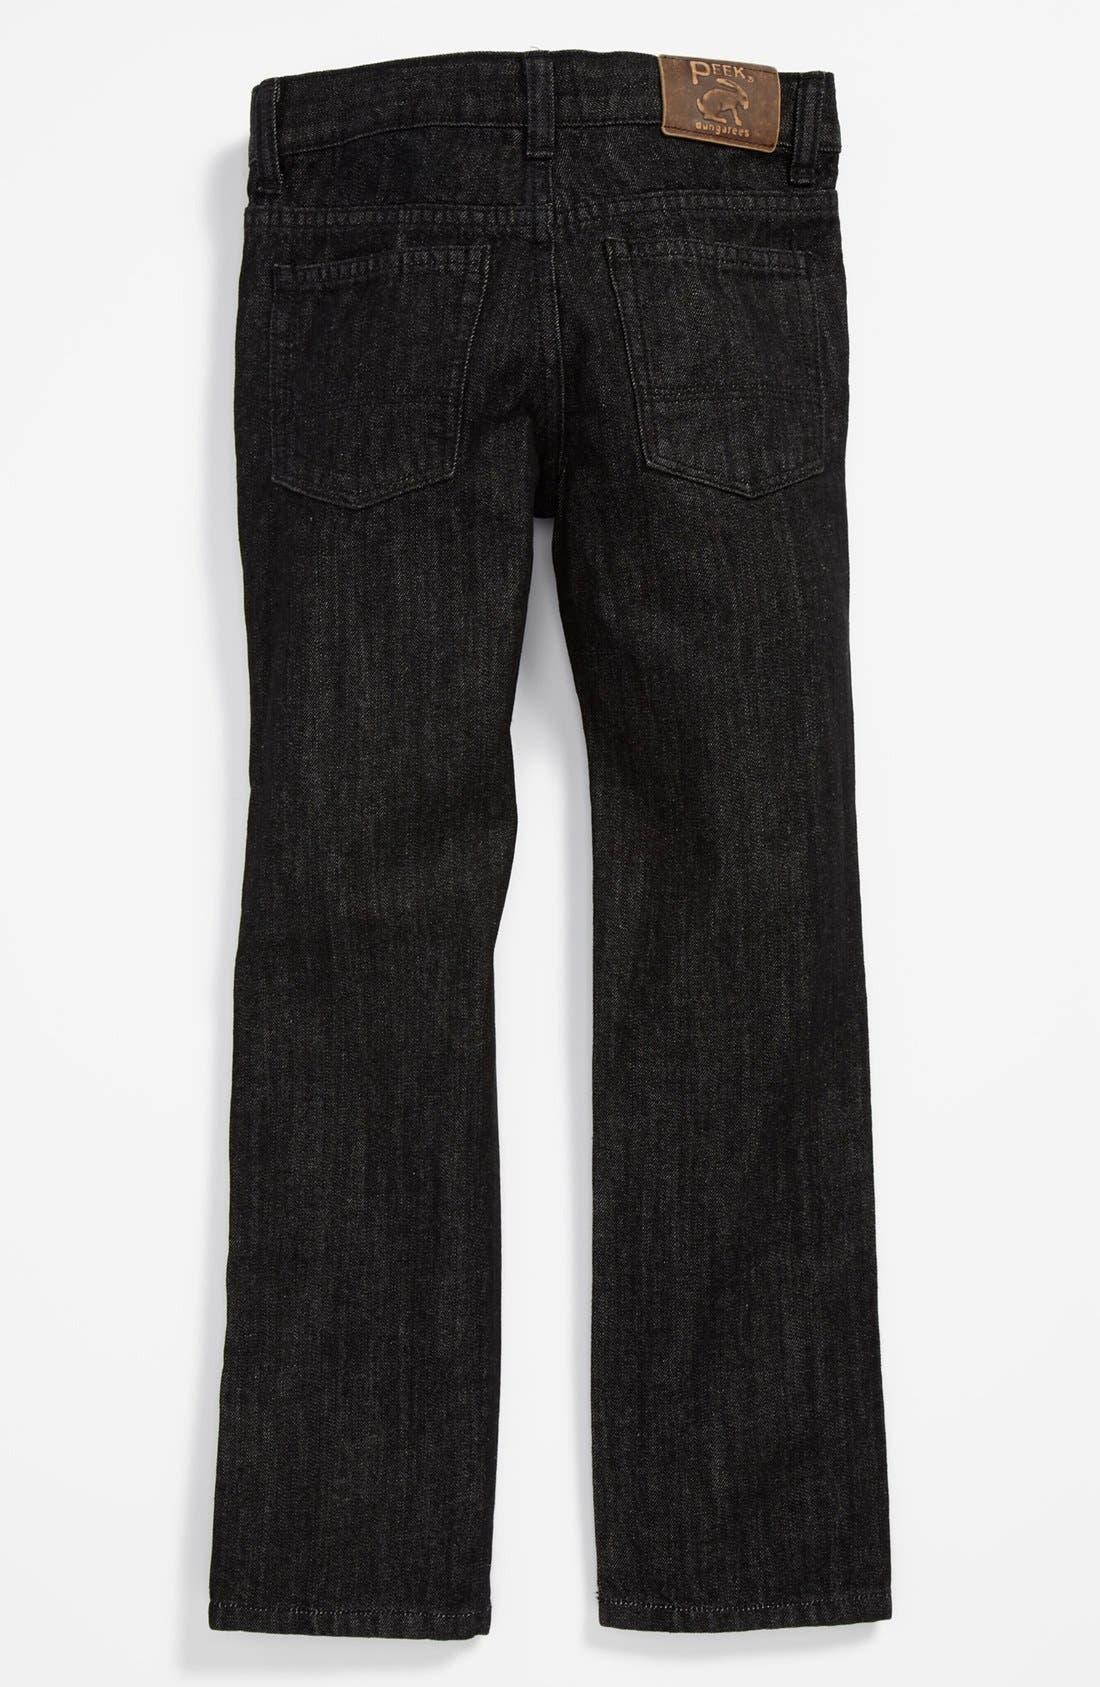 Alternate Image 1 Selected - Peek 'Ellis' Straight Leg Jeans (Toddler Boys, Little Boys & Big Boys)